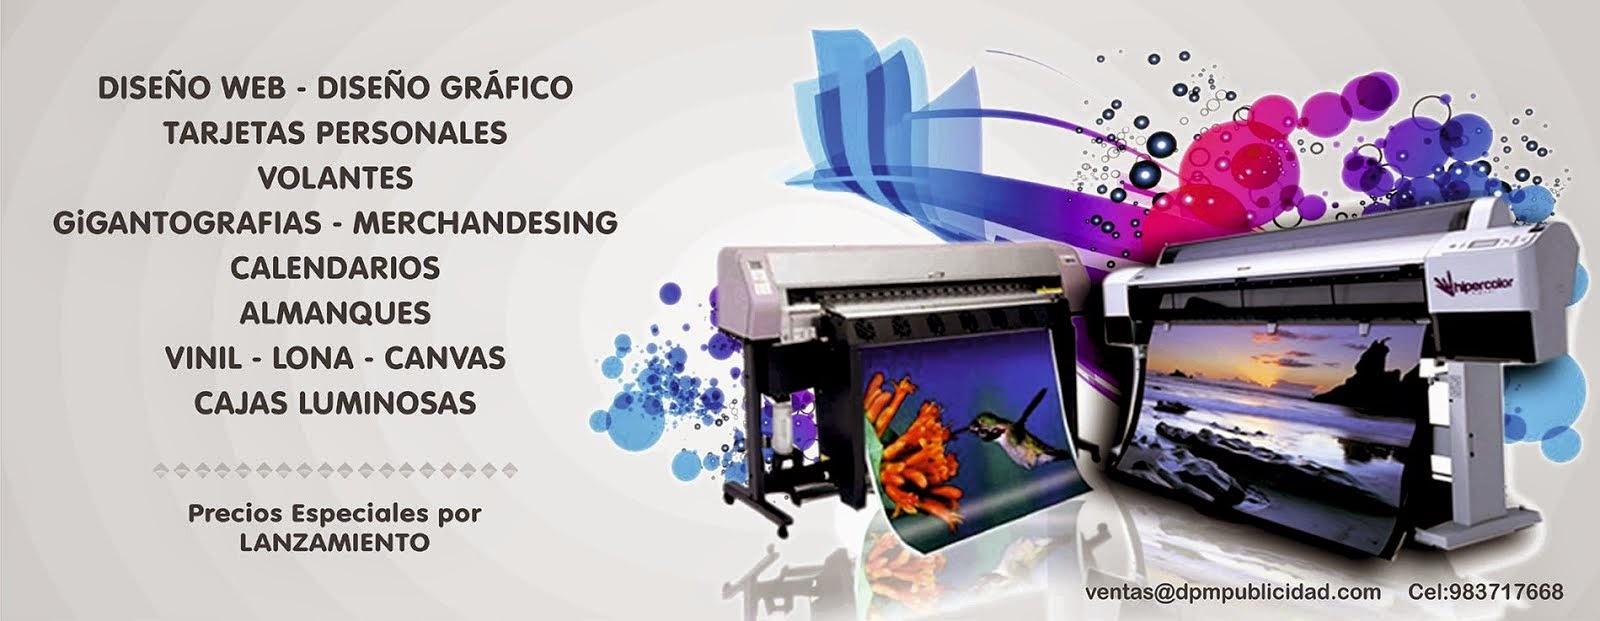 Gigantografias - Diseño Grafico - Merchandising